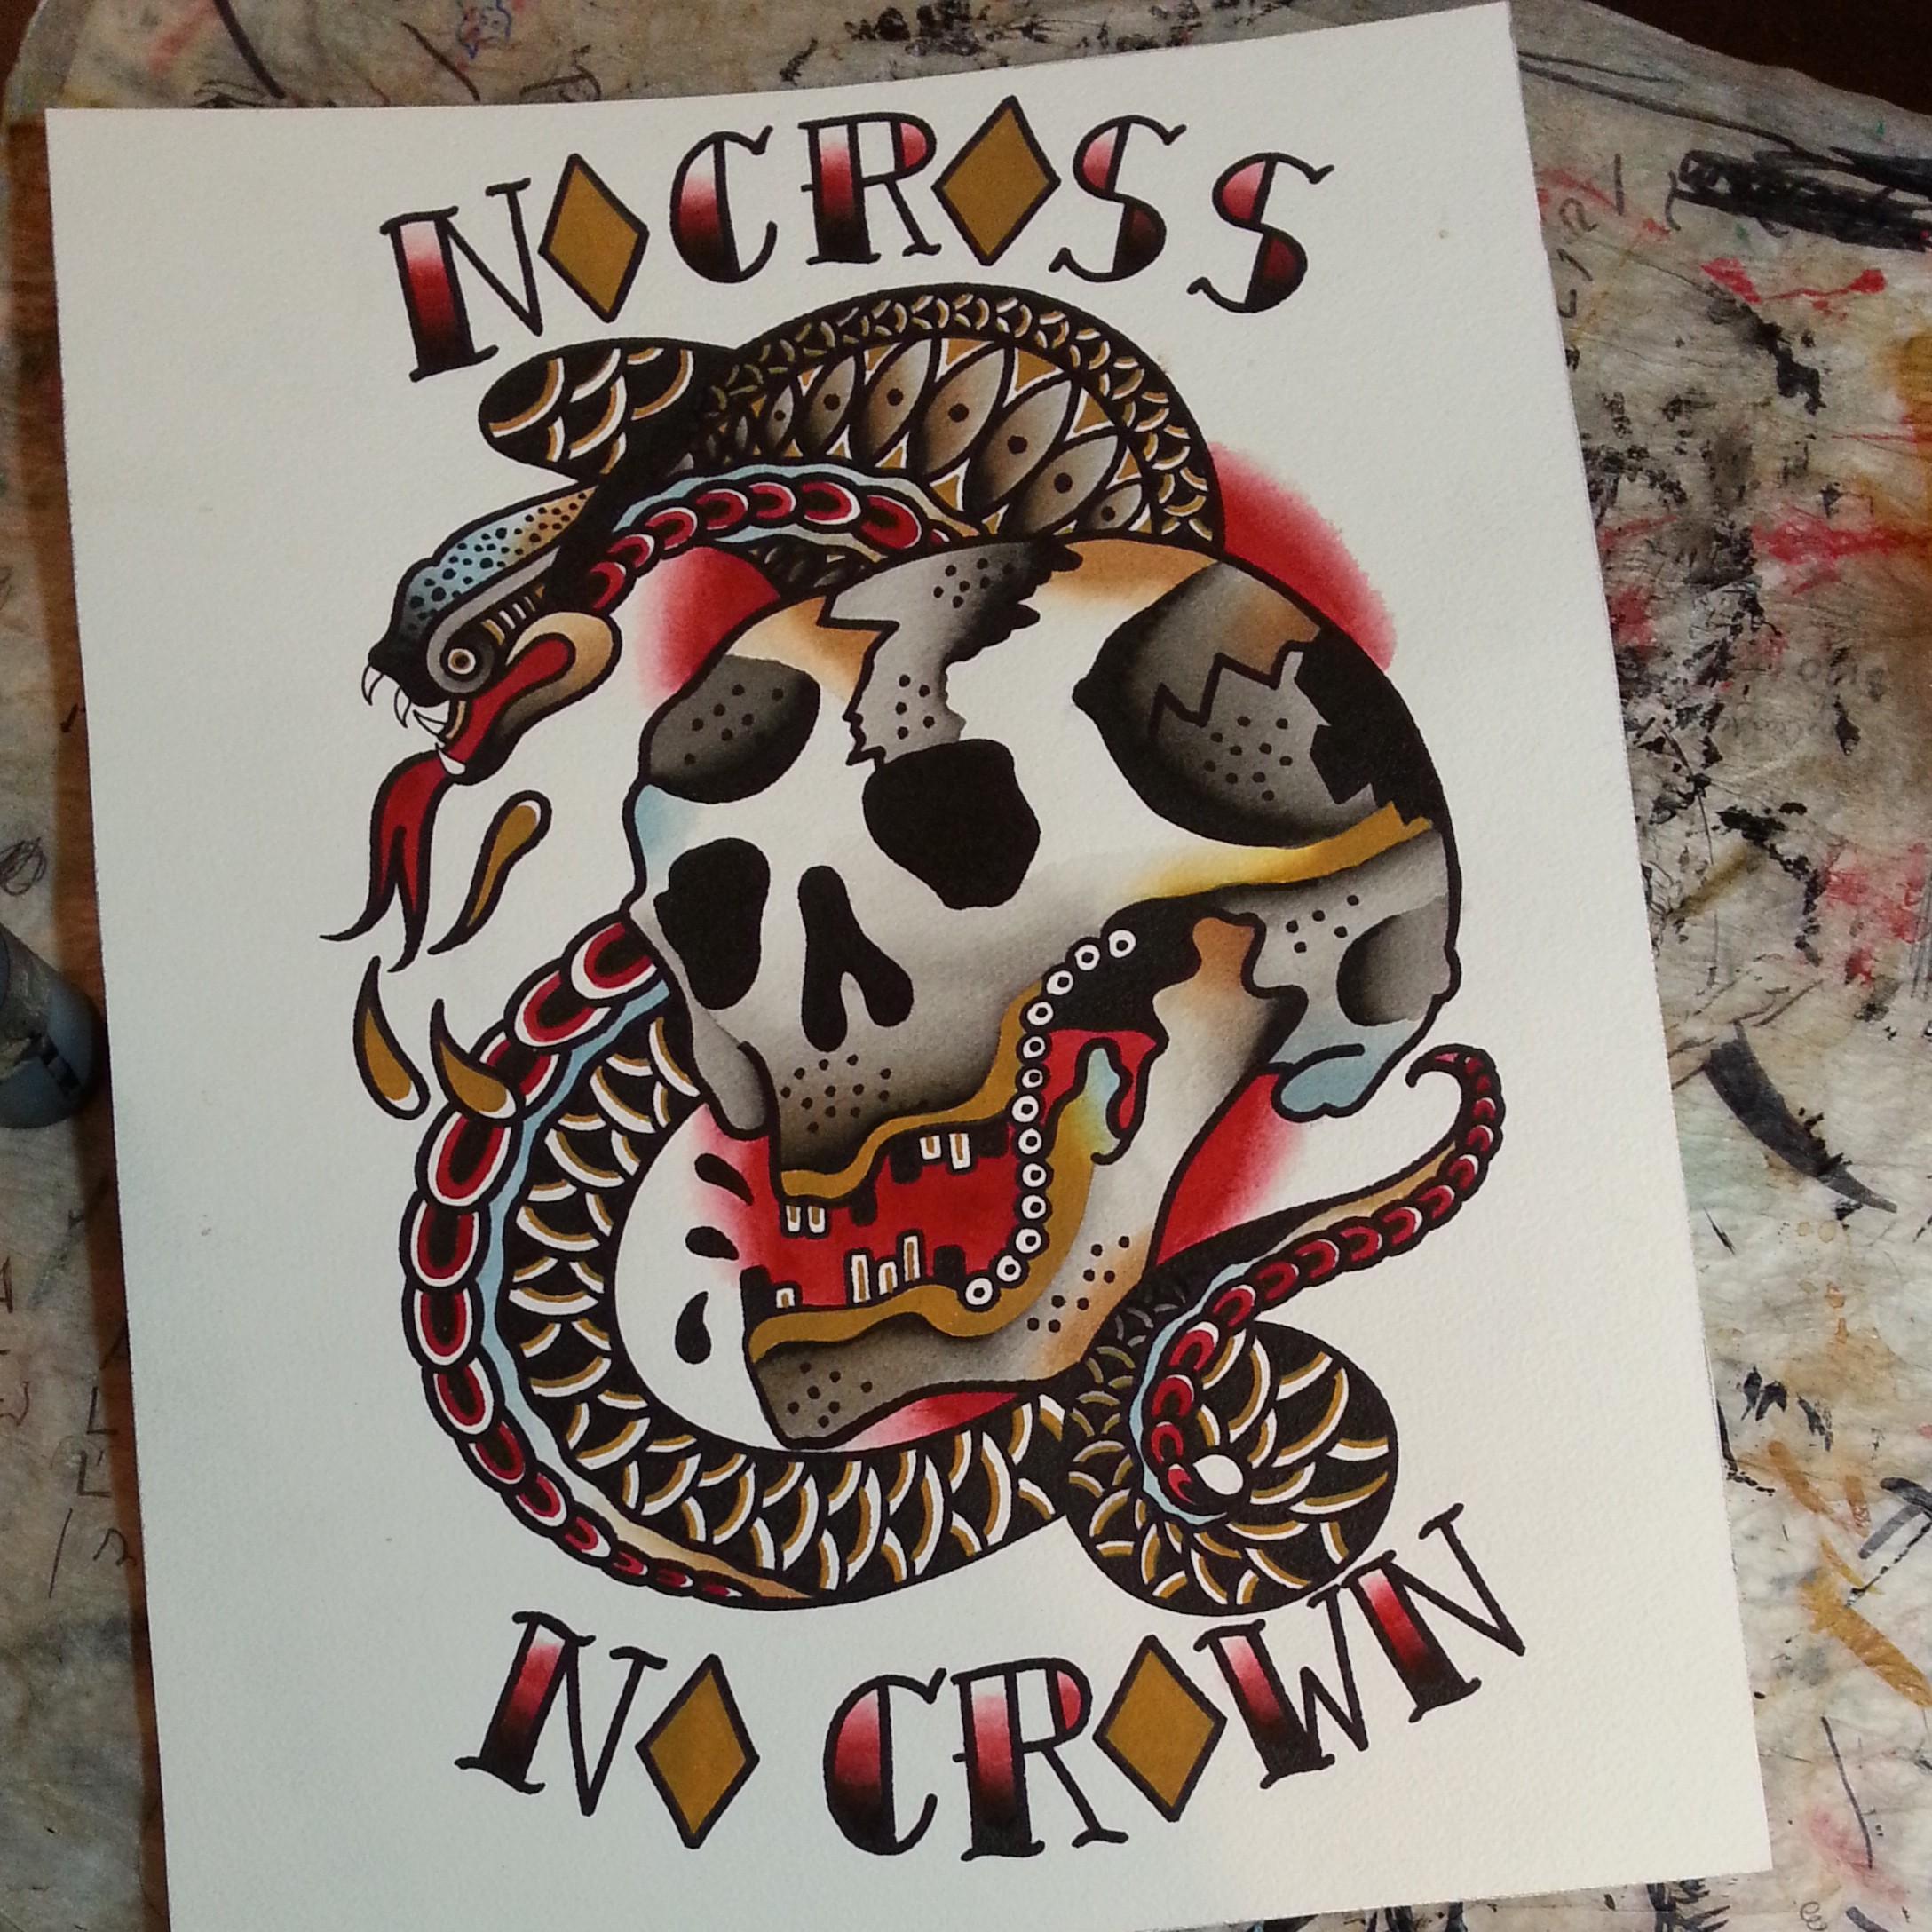 Crown tattoo on tumblr - Nocrossnocrowntattoocompany